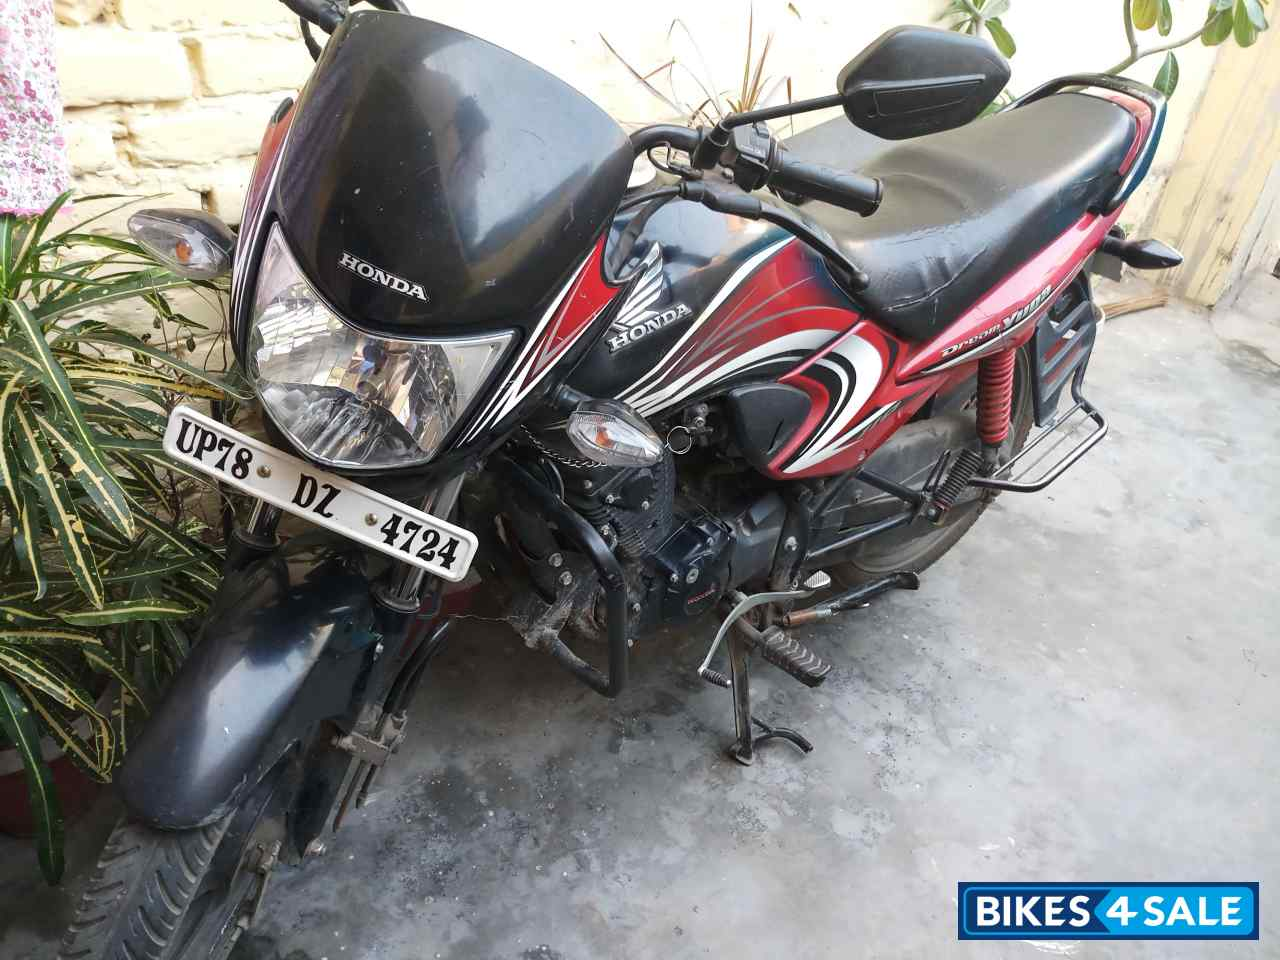 Used 2015 Model Honda Dream Yuga For Sale In Kanpur Nagar Id 190107 Red Black Colour Bikes4sale